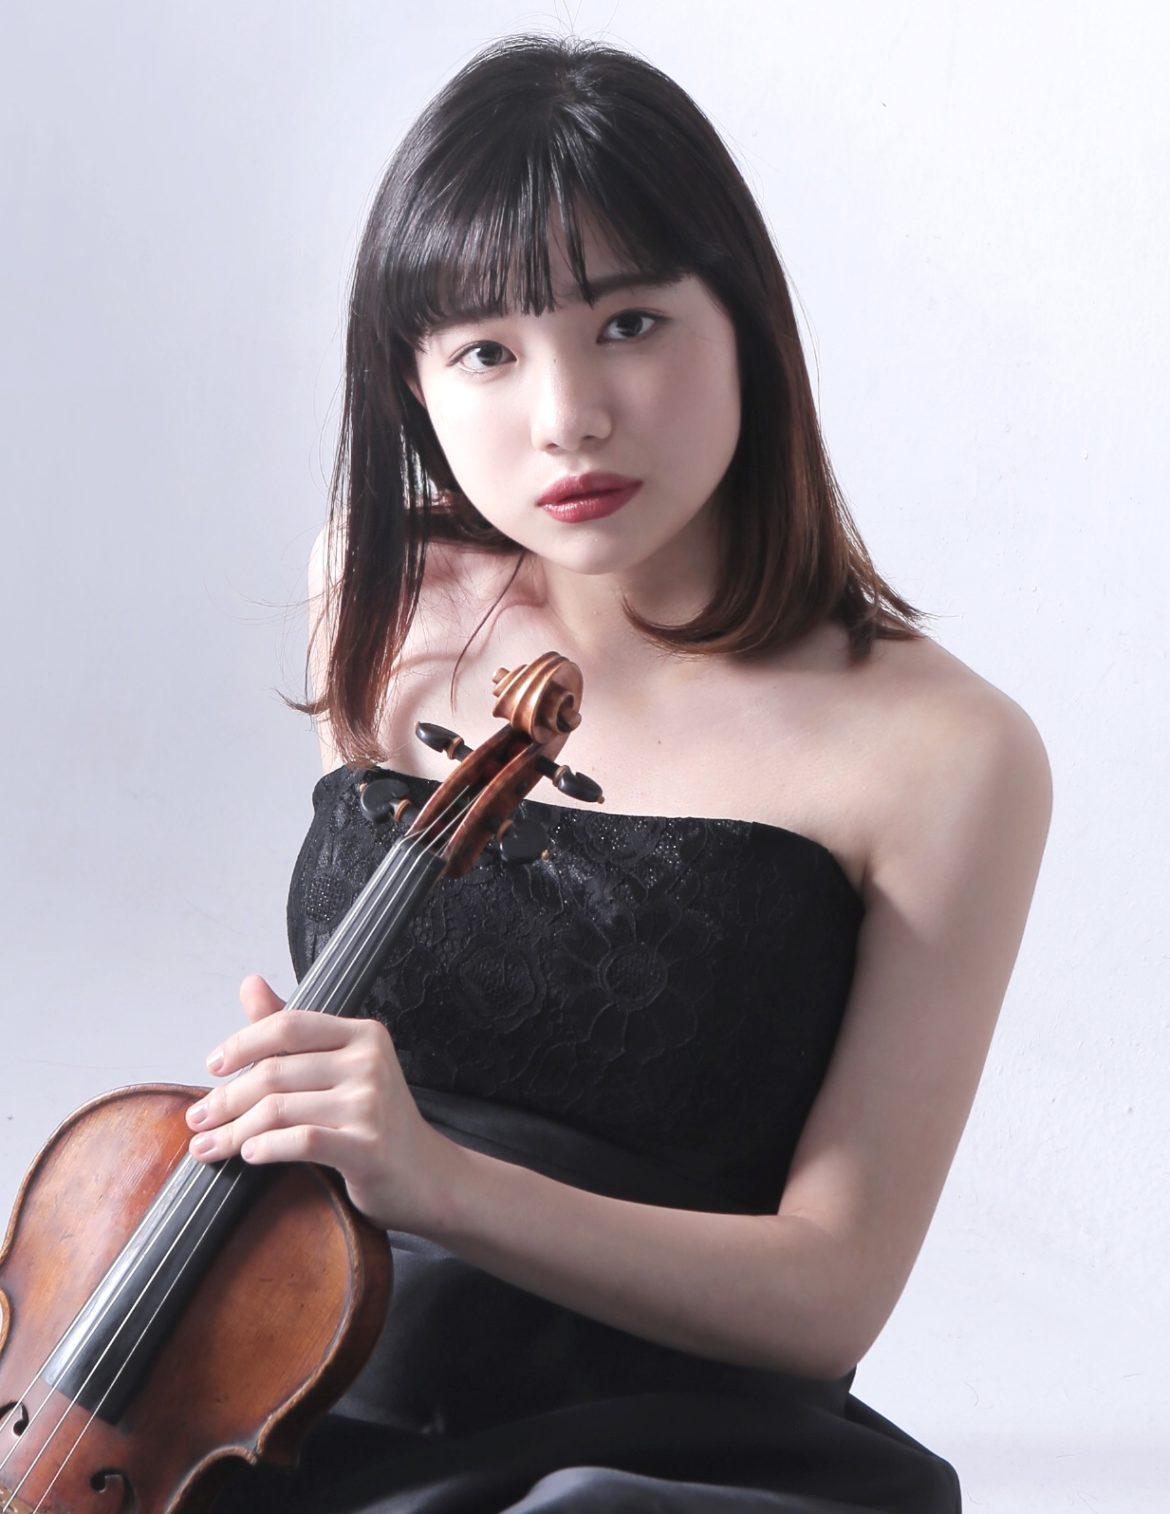 Aya Yamaguchi (Vn.)